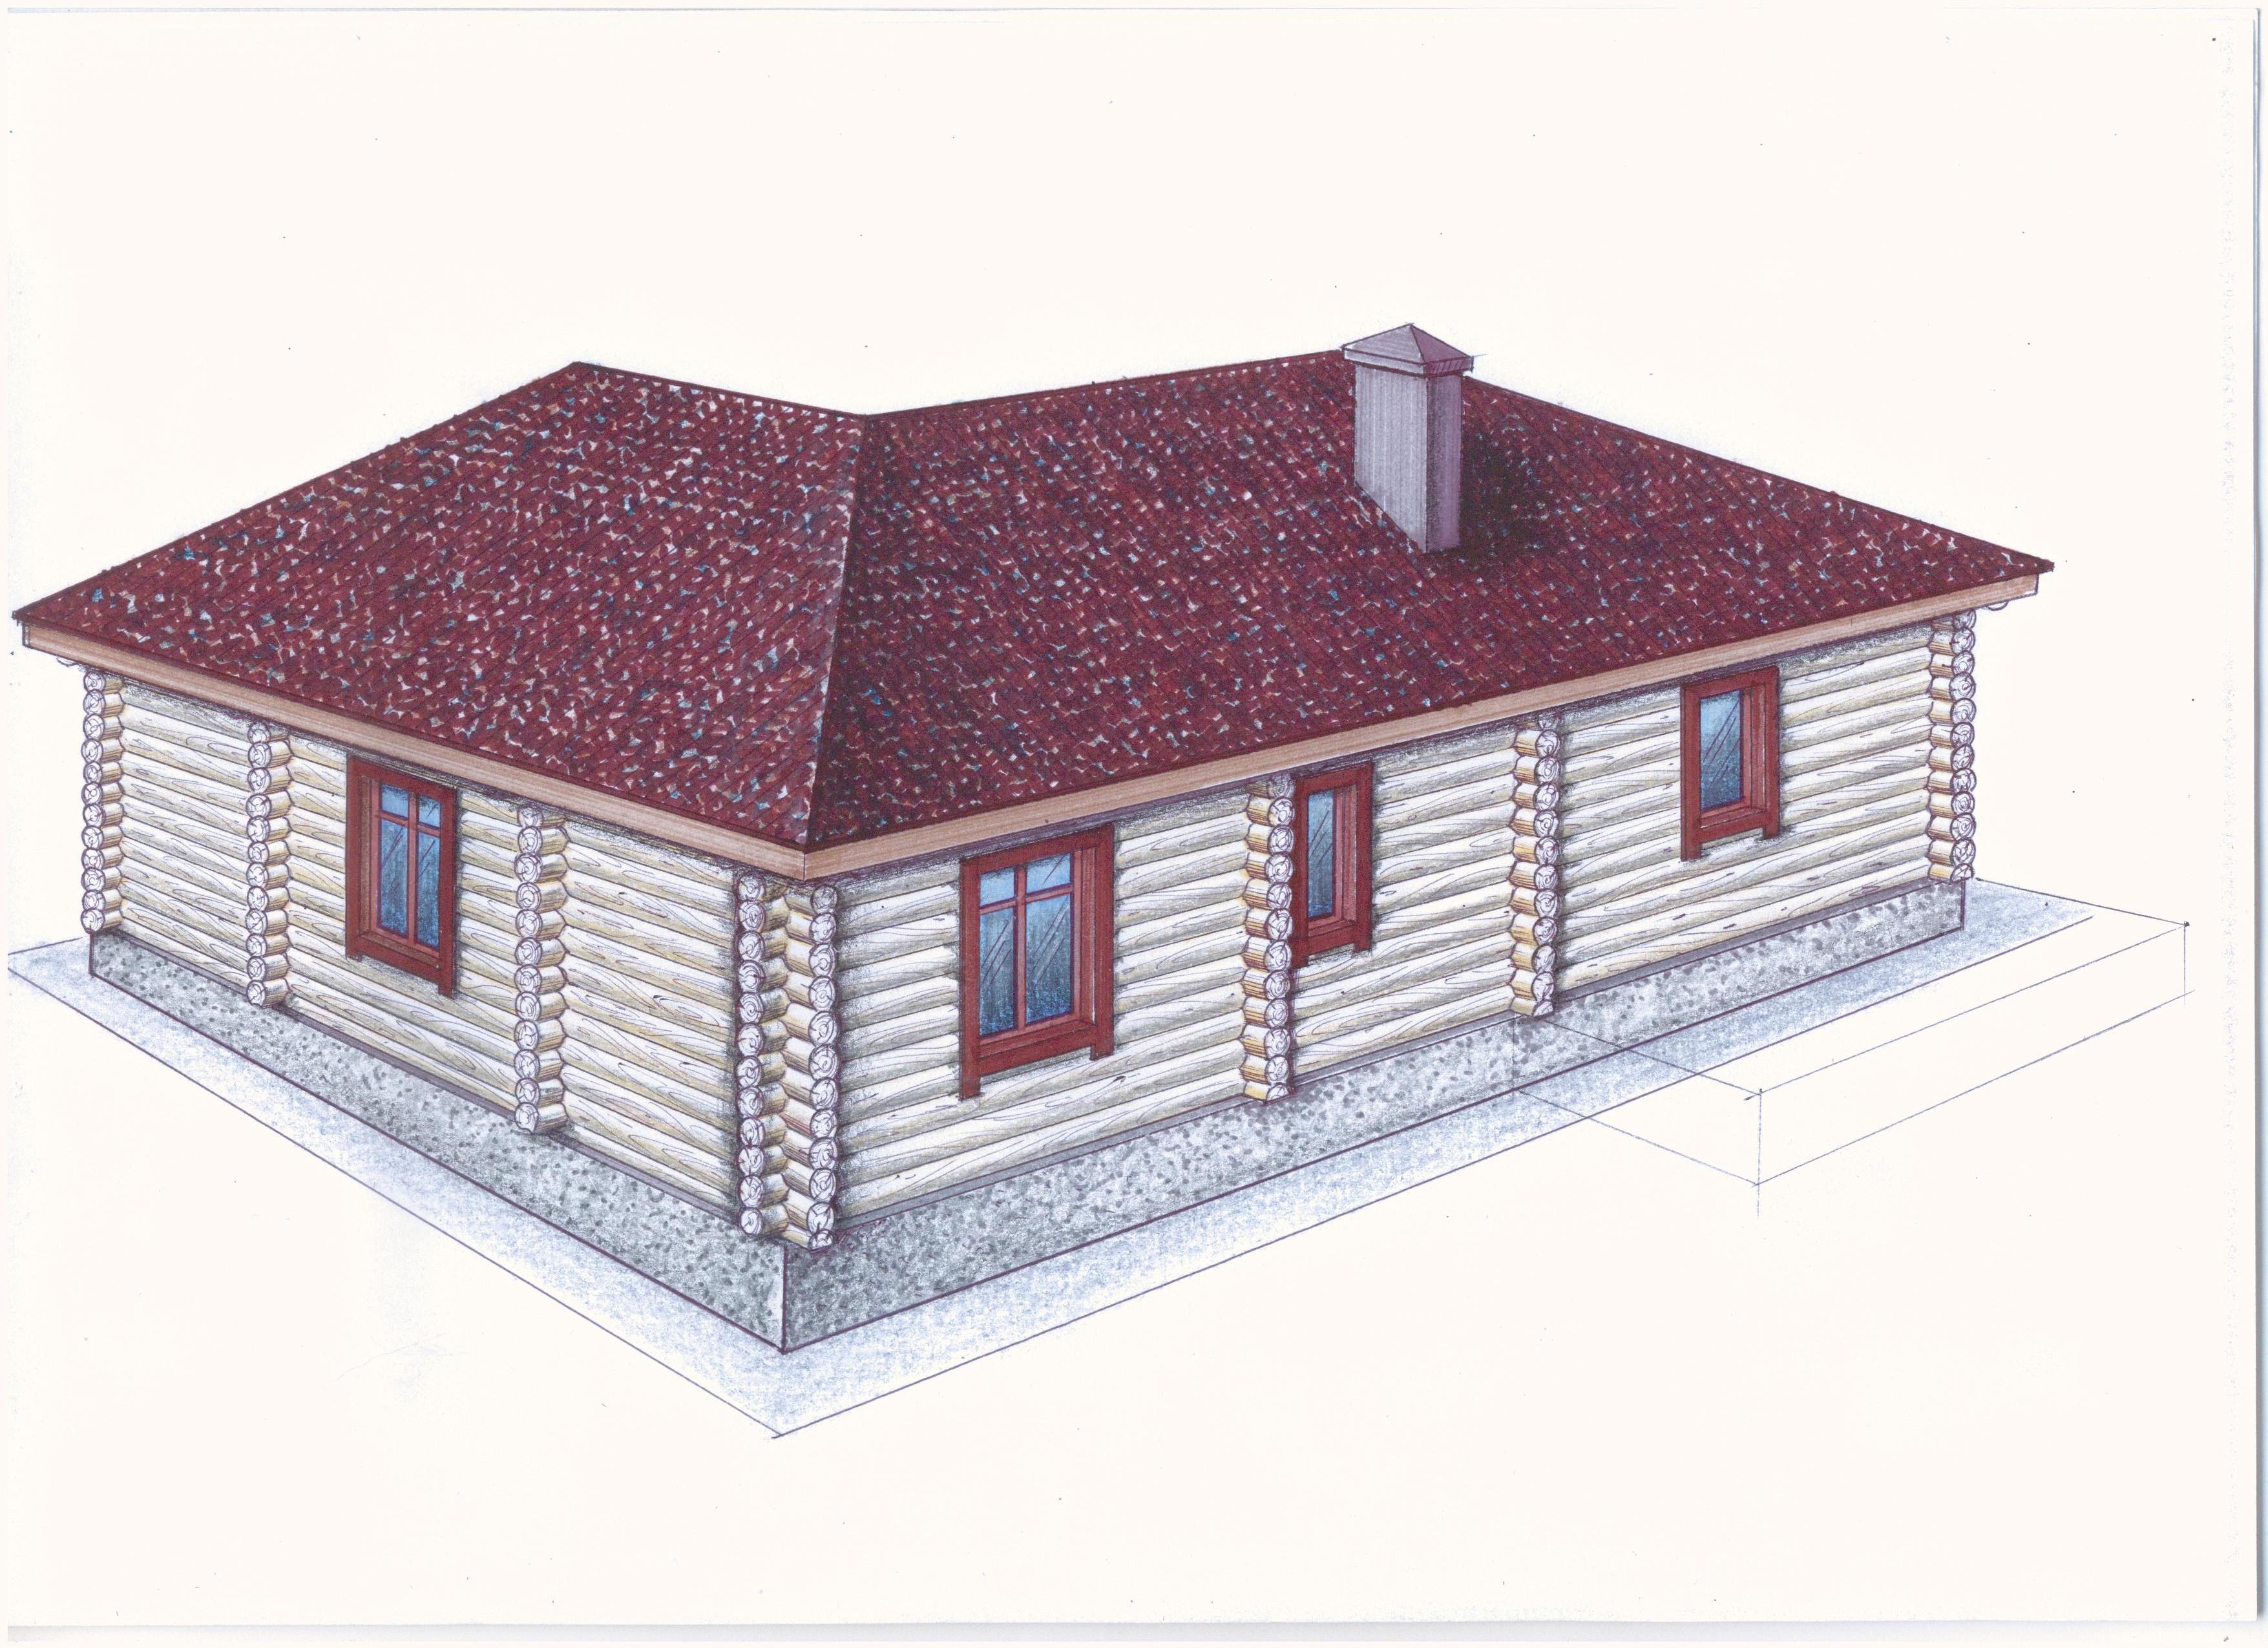 Проект одноэтажного дома из оцилиндрованного бревн фасад